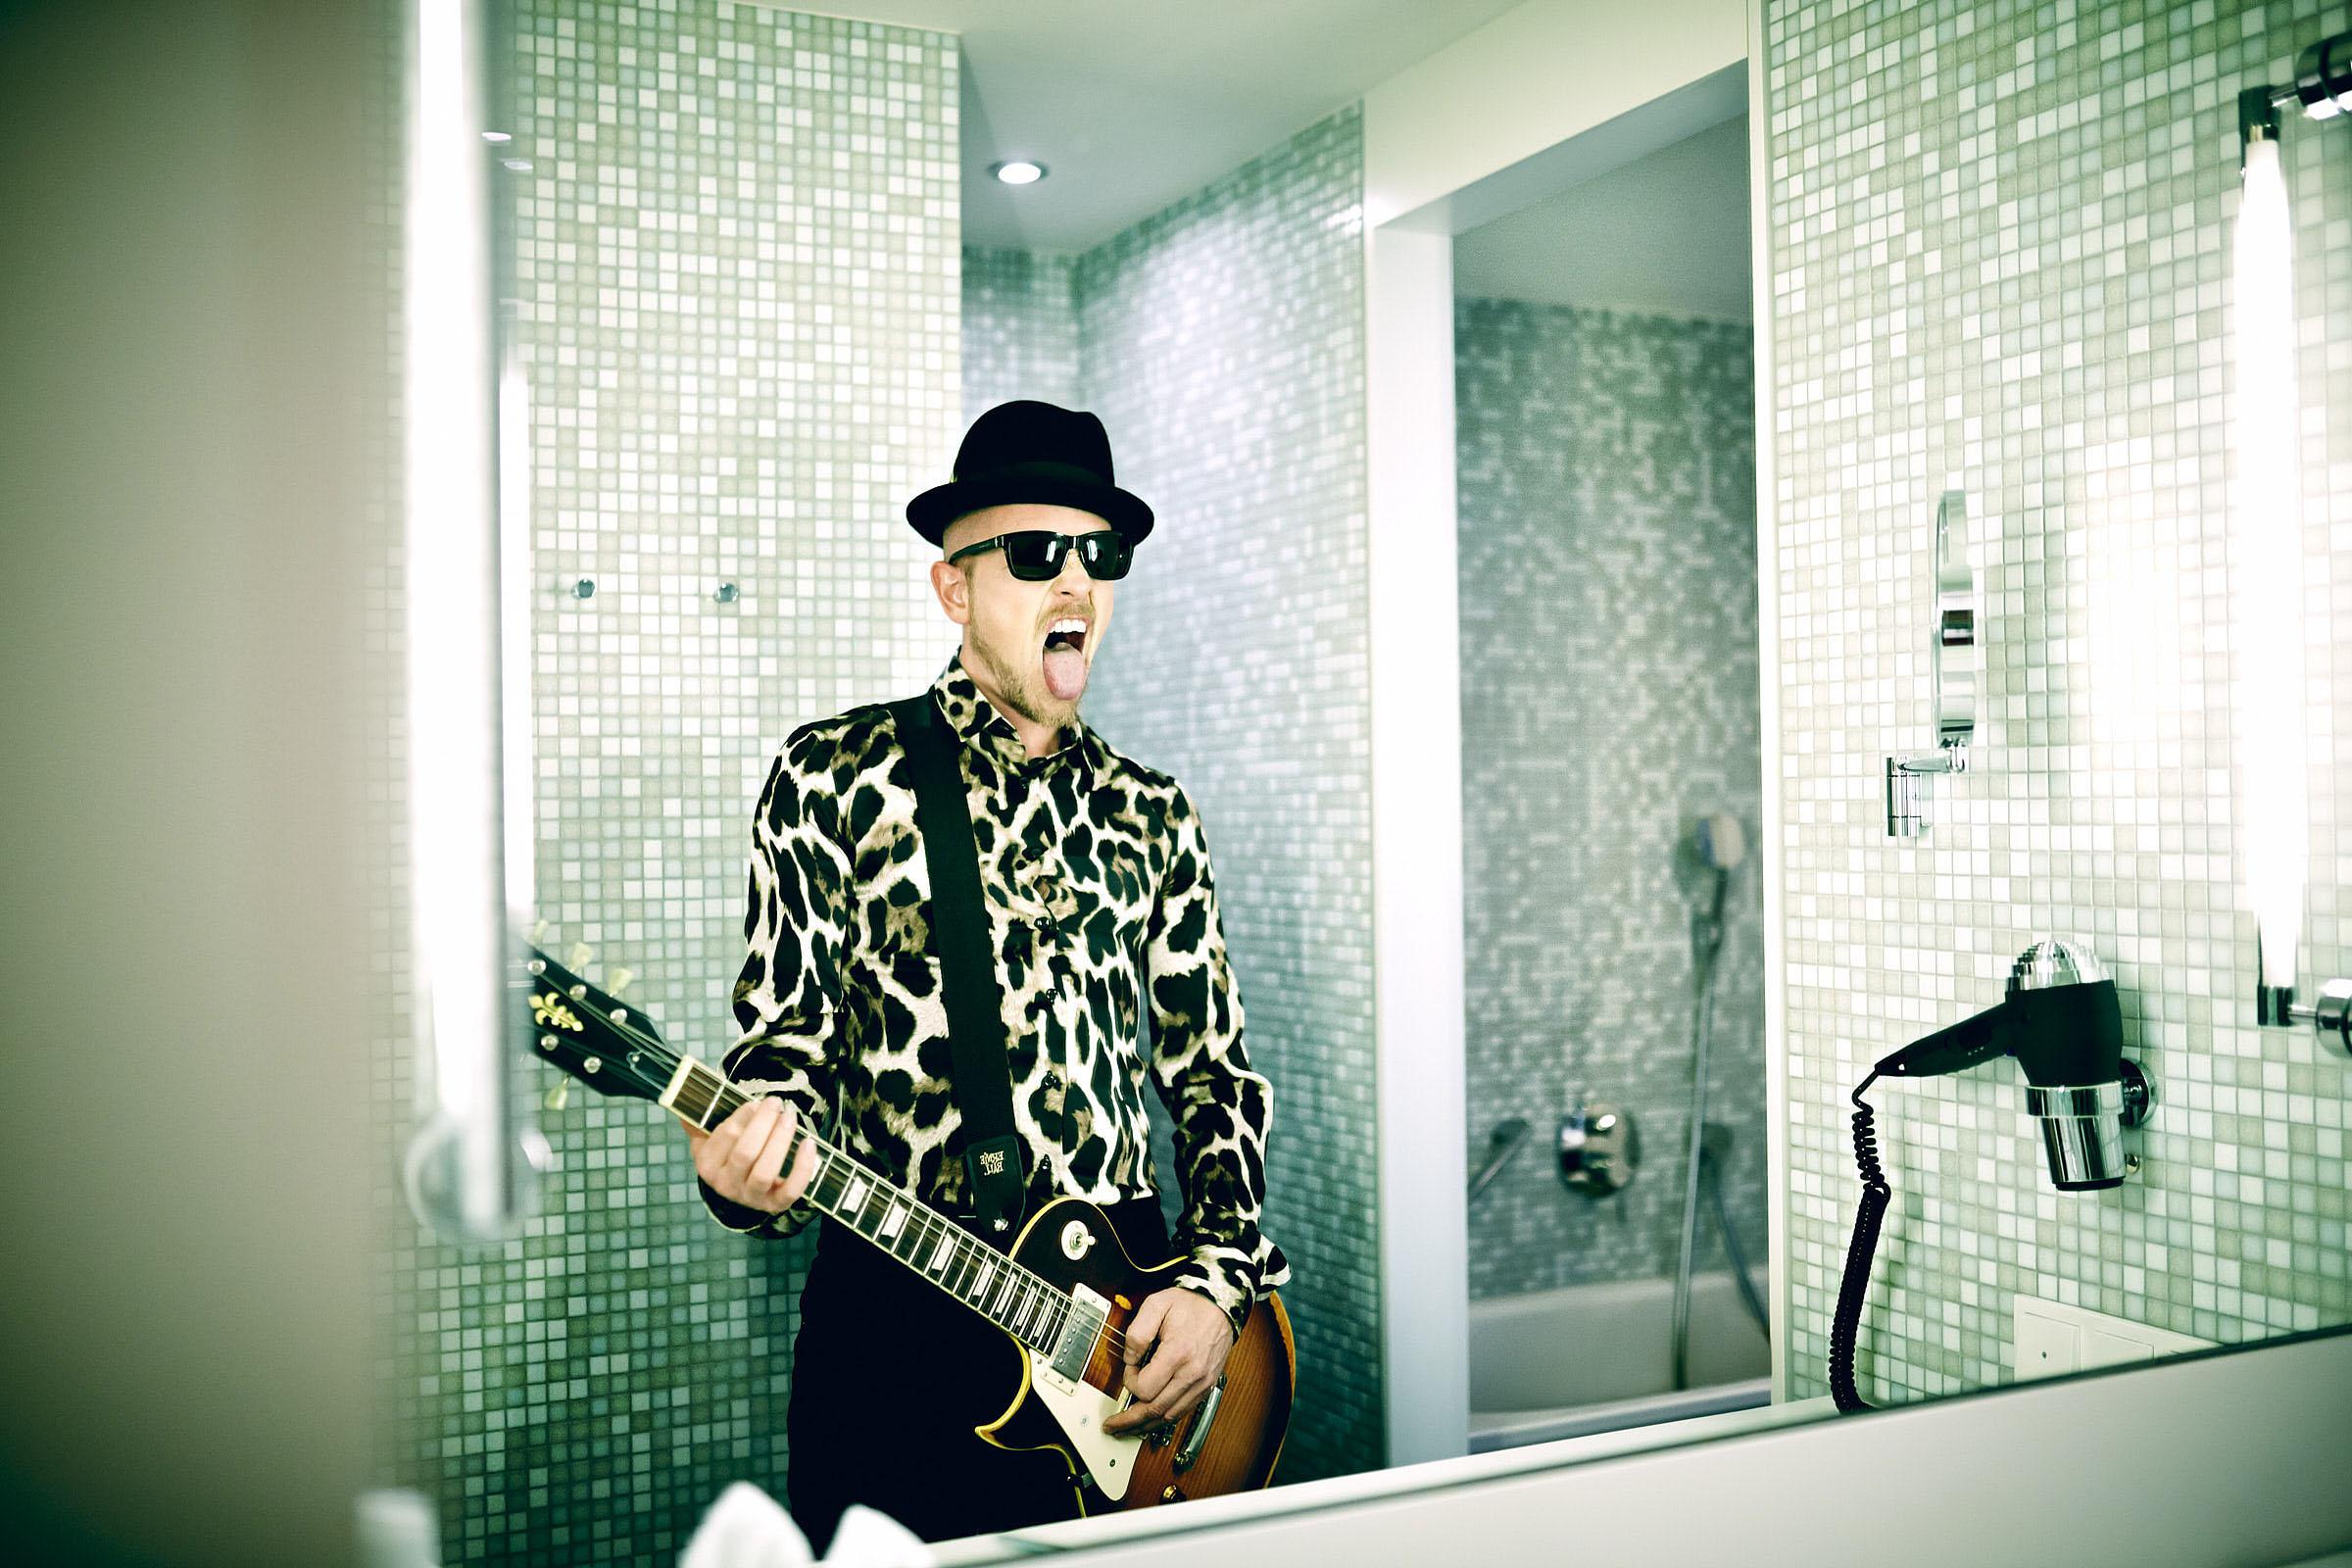 Jan Delay am 09.12.2013 im Empire Riverside Hotel Hamburg